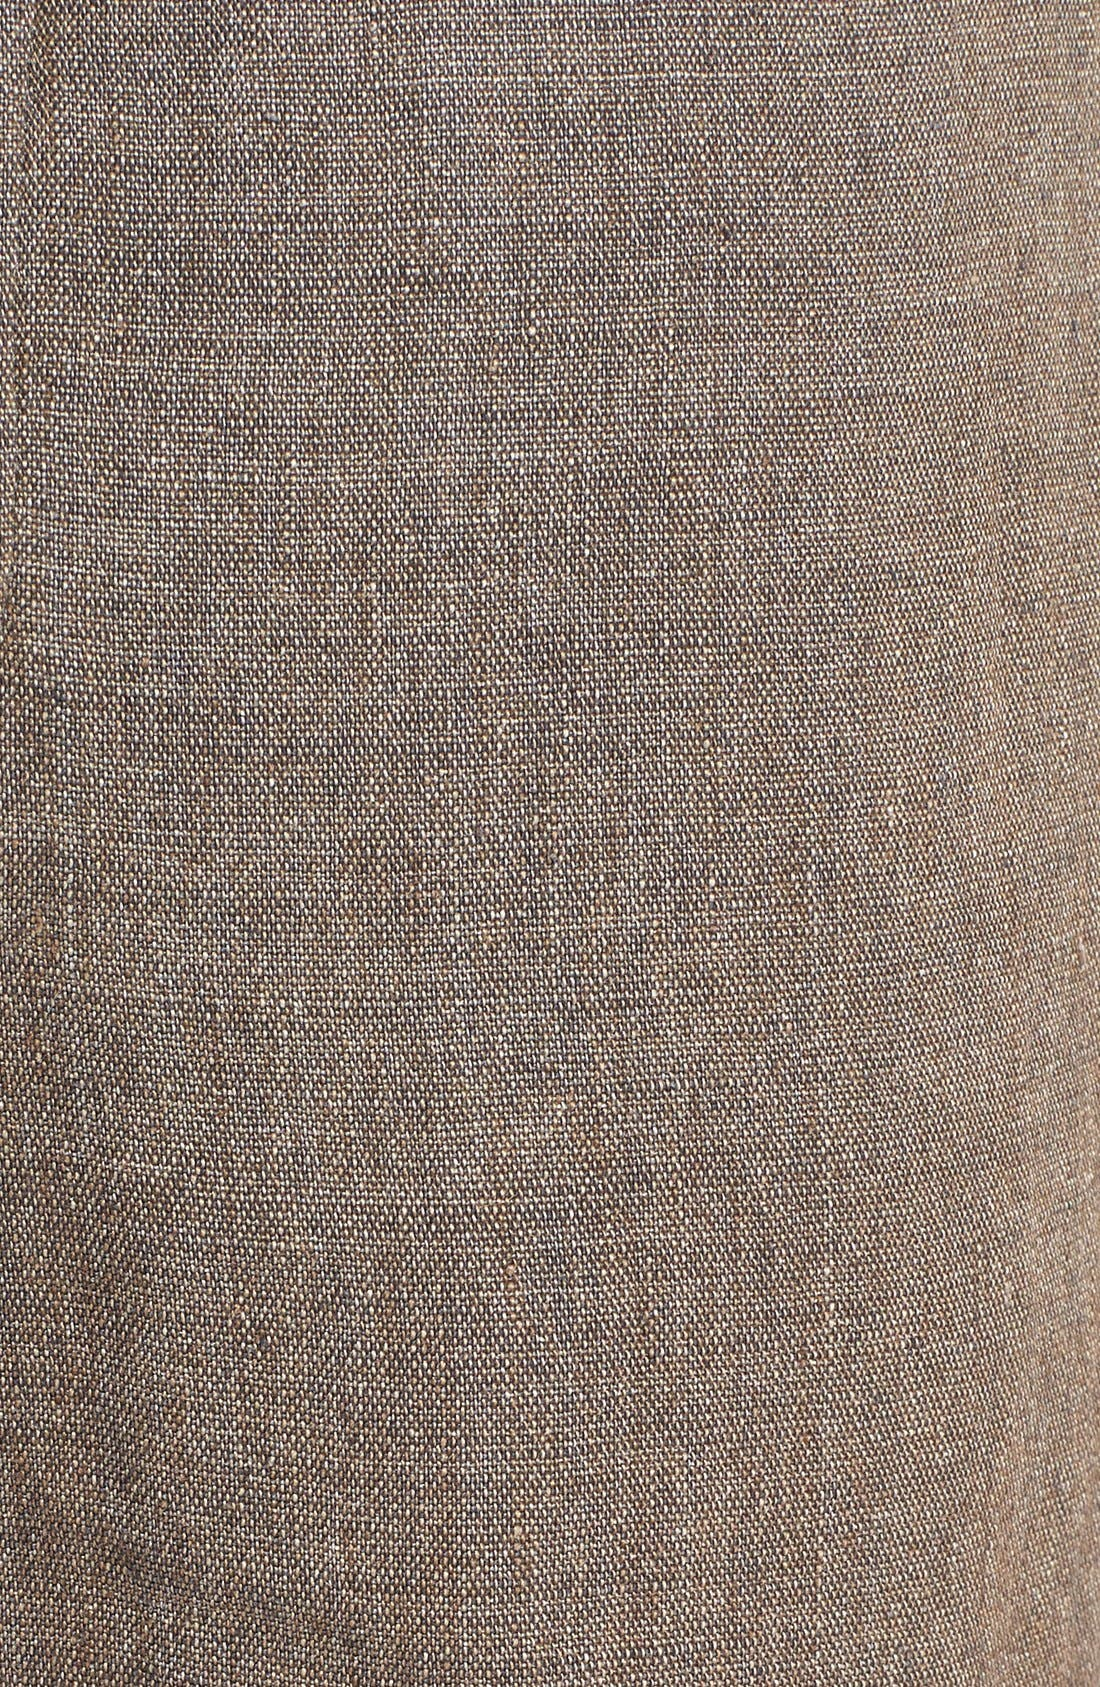 'Delave' Drawstring Linen Pants,                             Alternate thumbnail 5, color,                             207